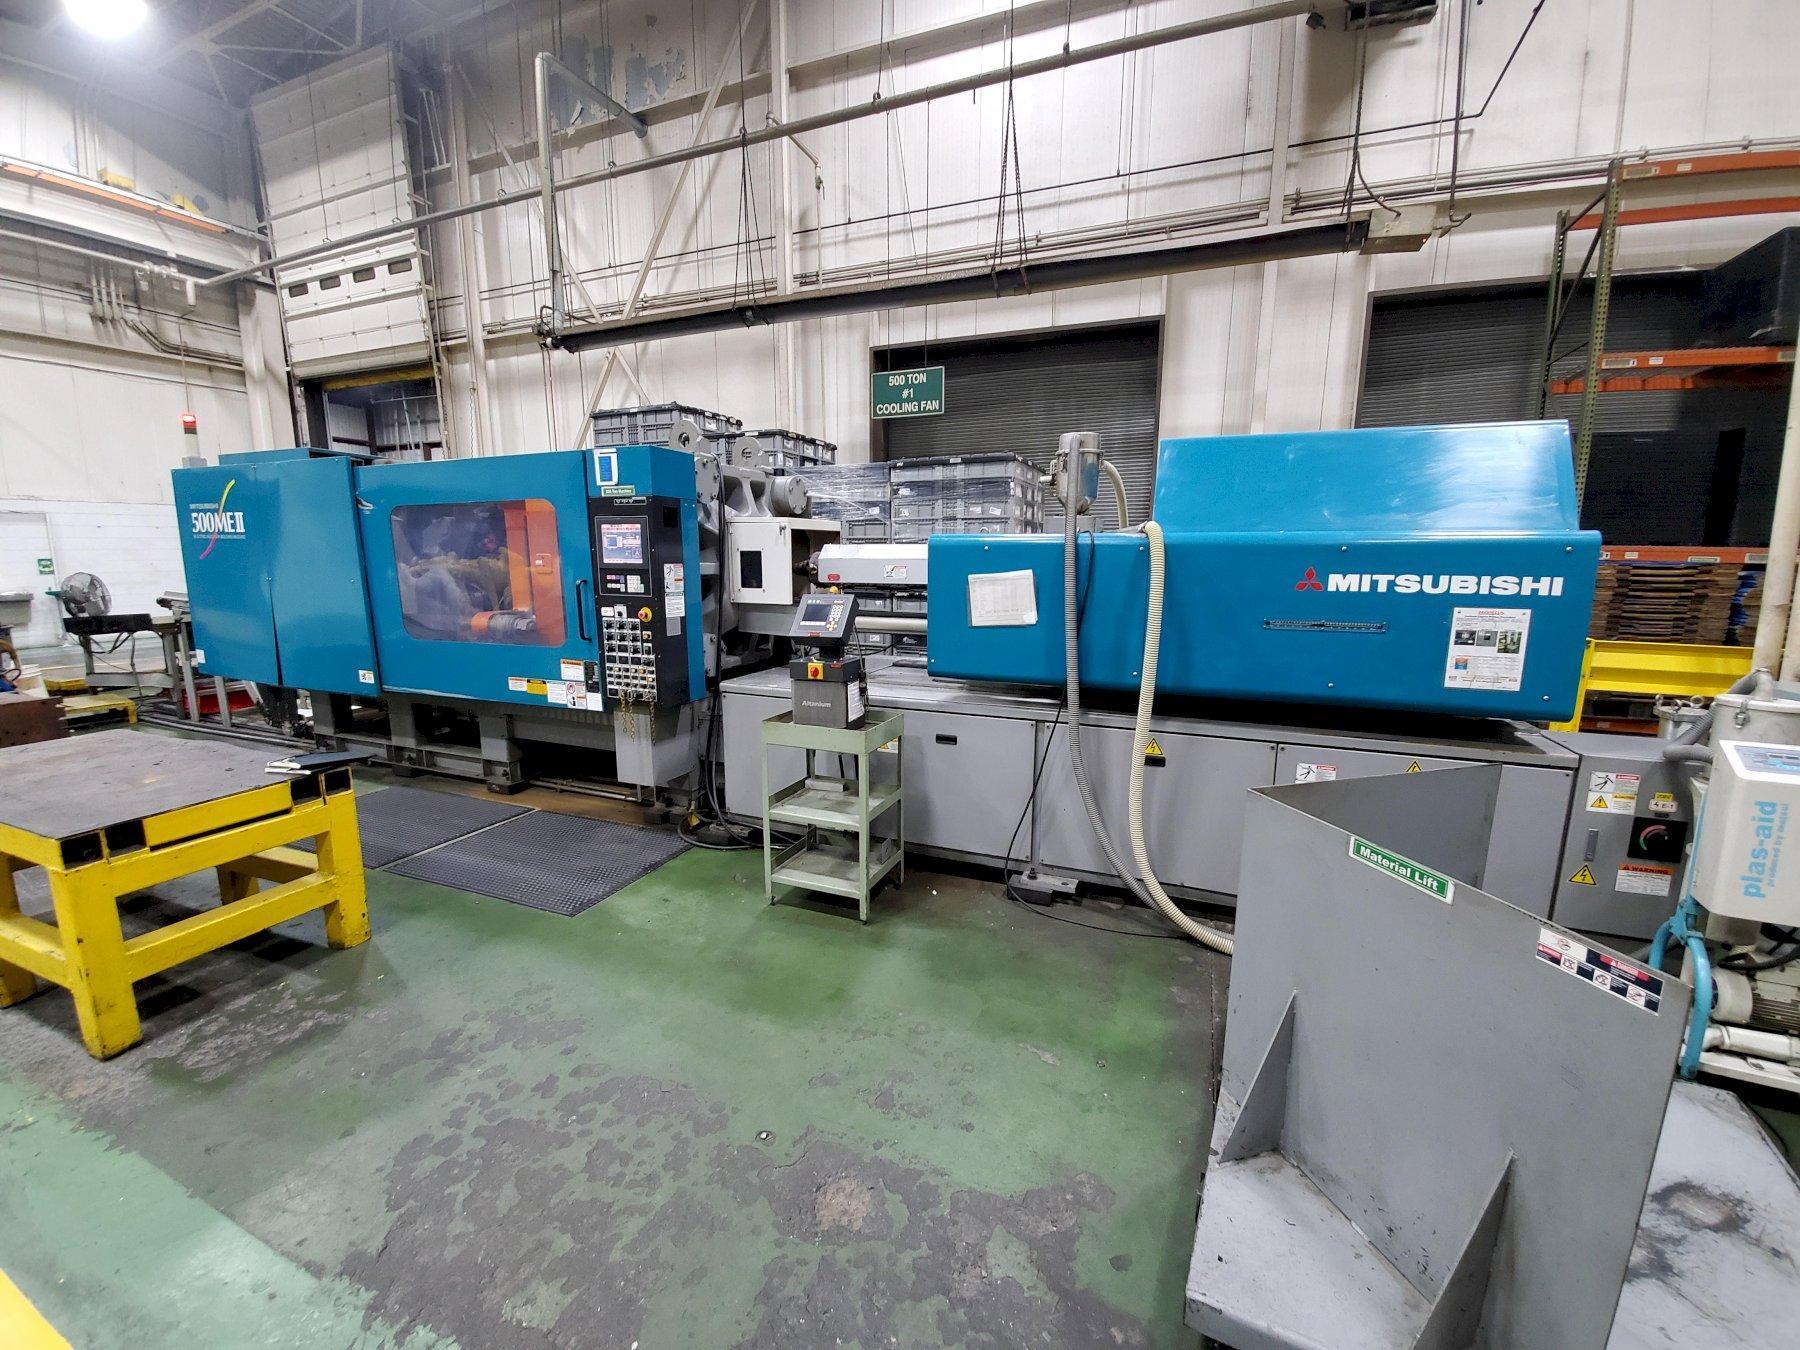 Mitsubishi Used ME500II-50S All Electric Molding Machine, 500 US ton, Yr. 2006, 43.7 oz PS